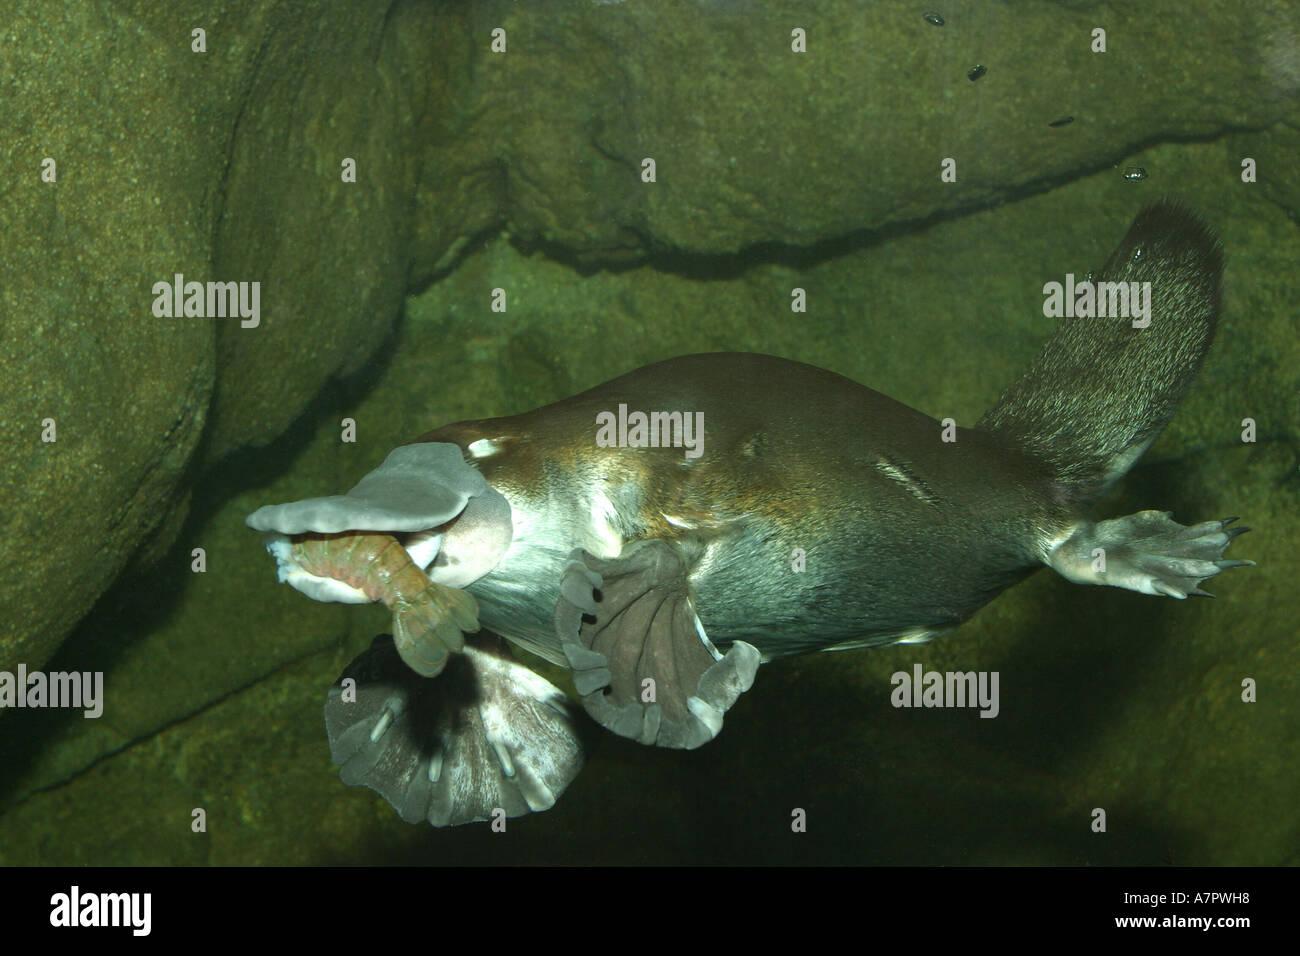 Platypus  Definition of Platypus by MerriamWebster